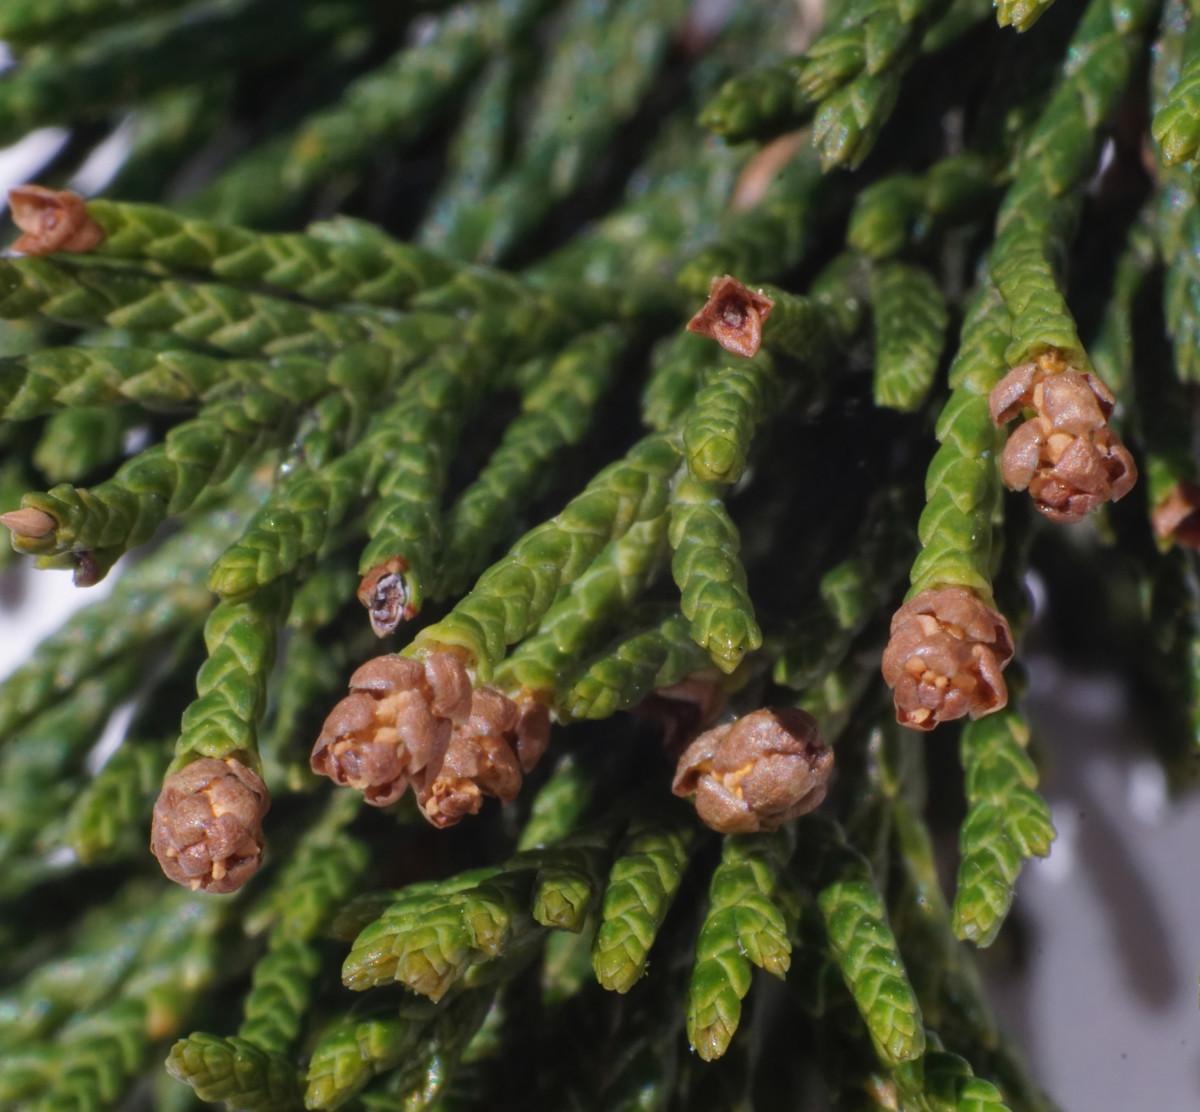 EASTERN RED CEDAR TREE POLLEN CONES (Male)